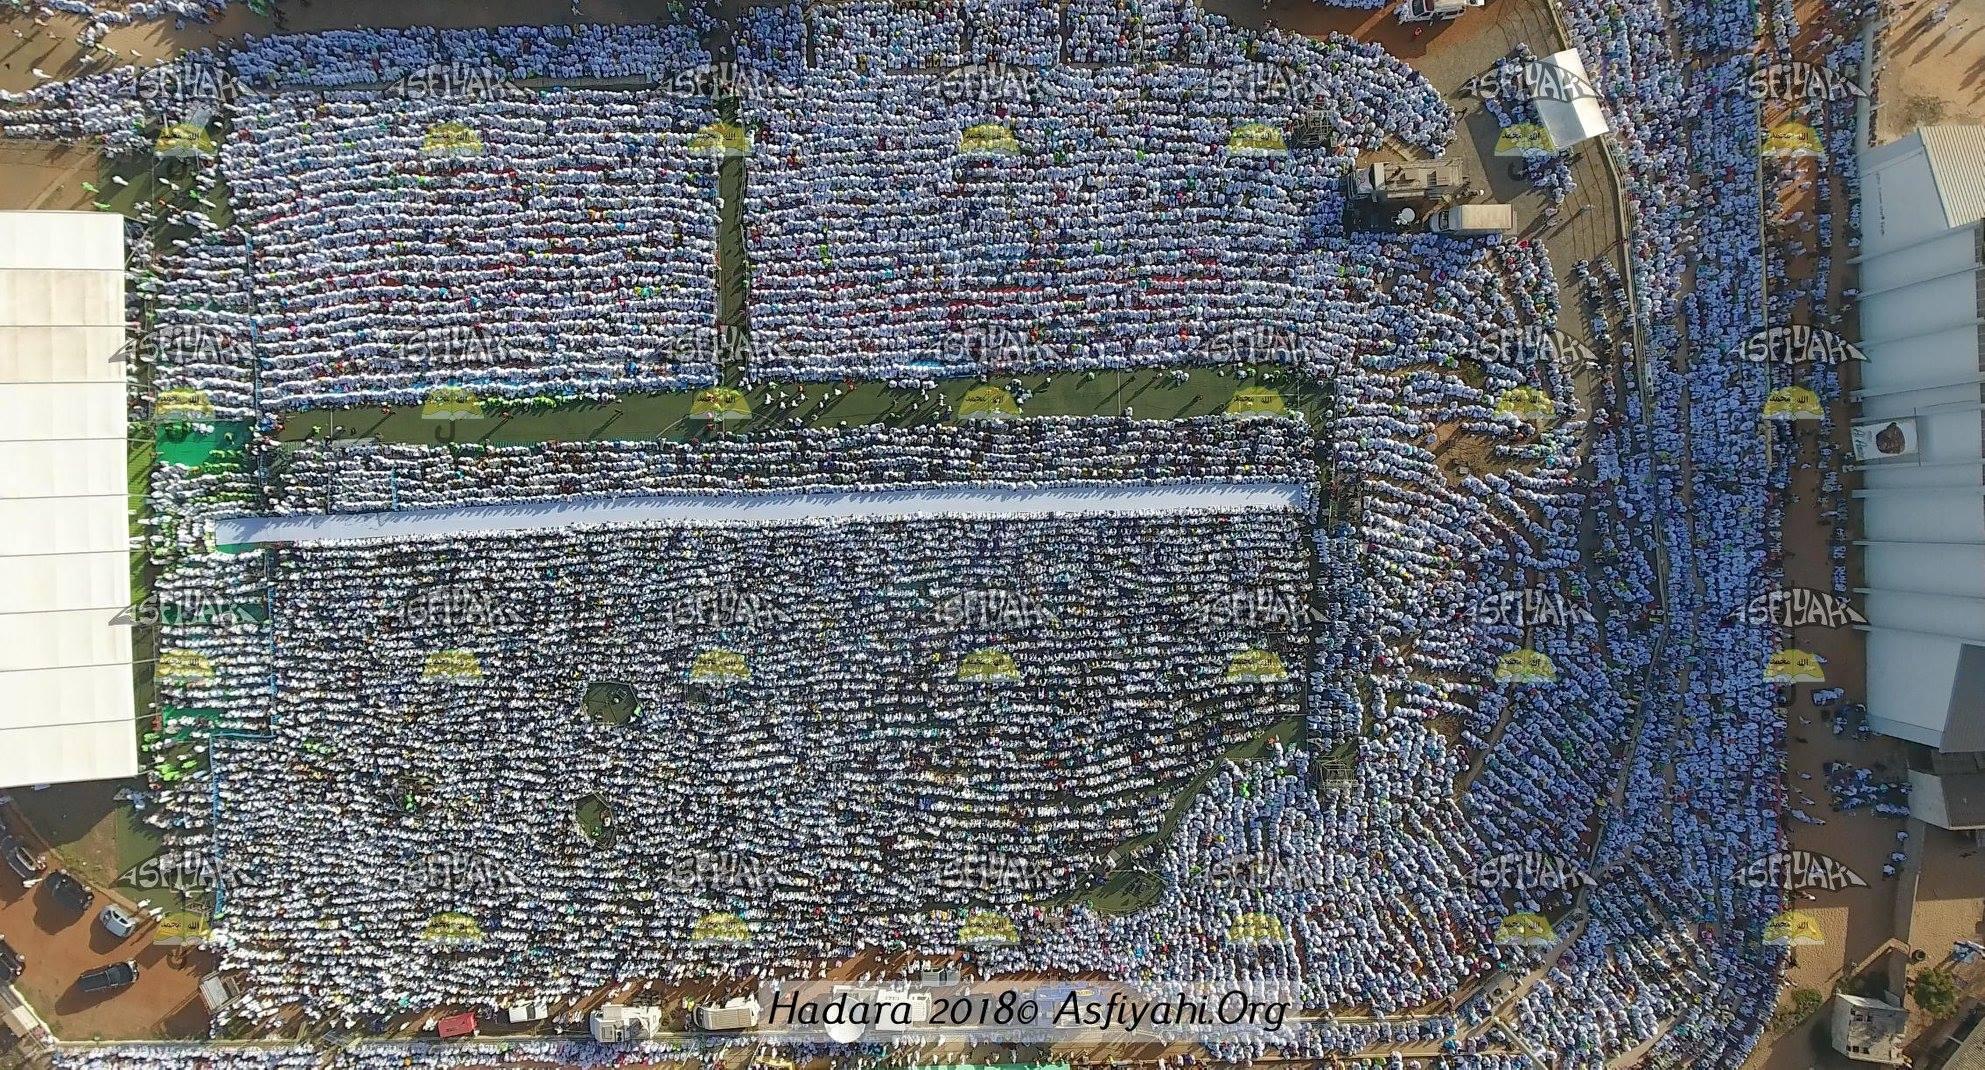 Hadaratoul Jumaah, stade amadou barry, Tidianes